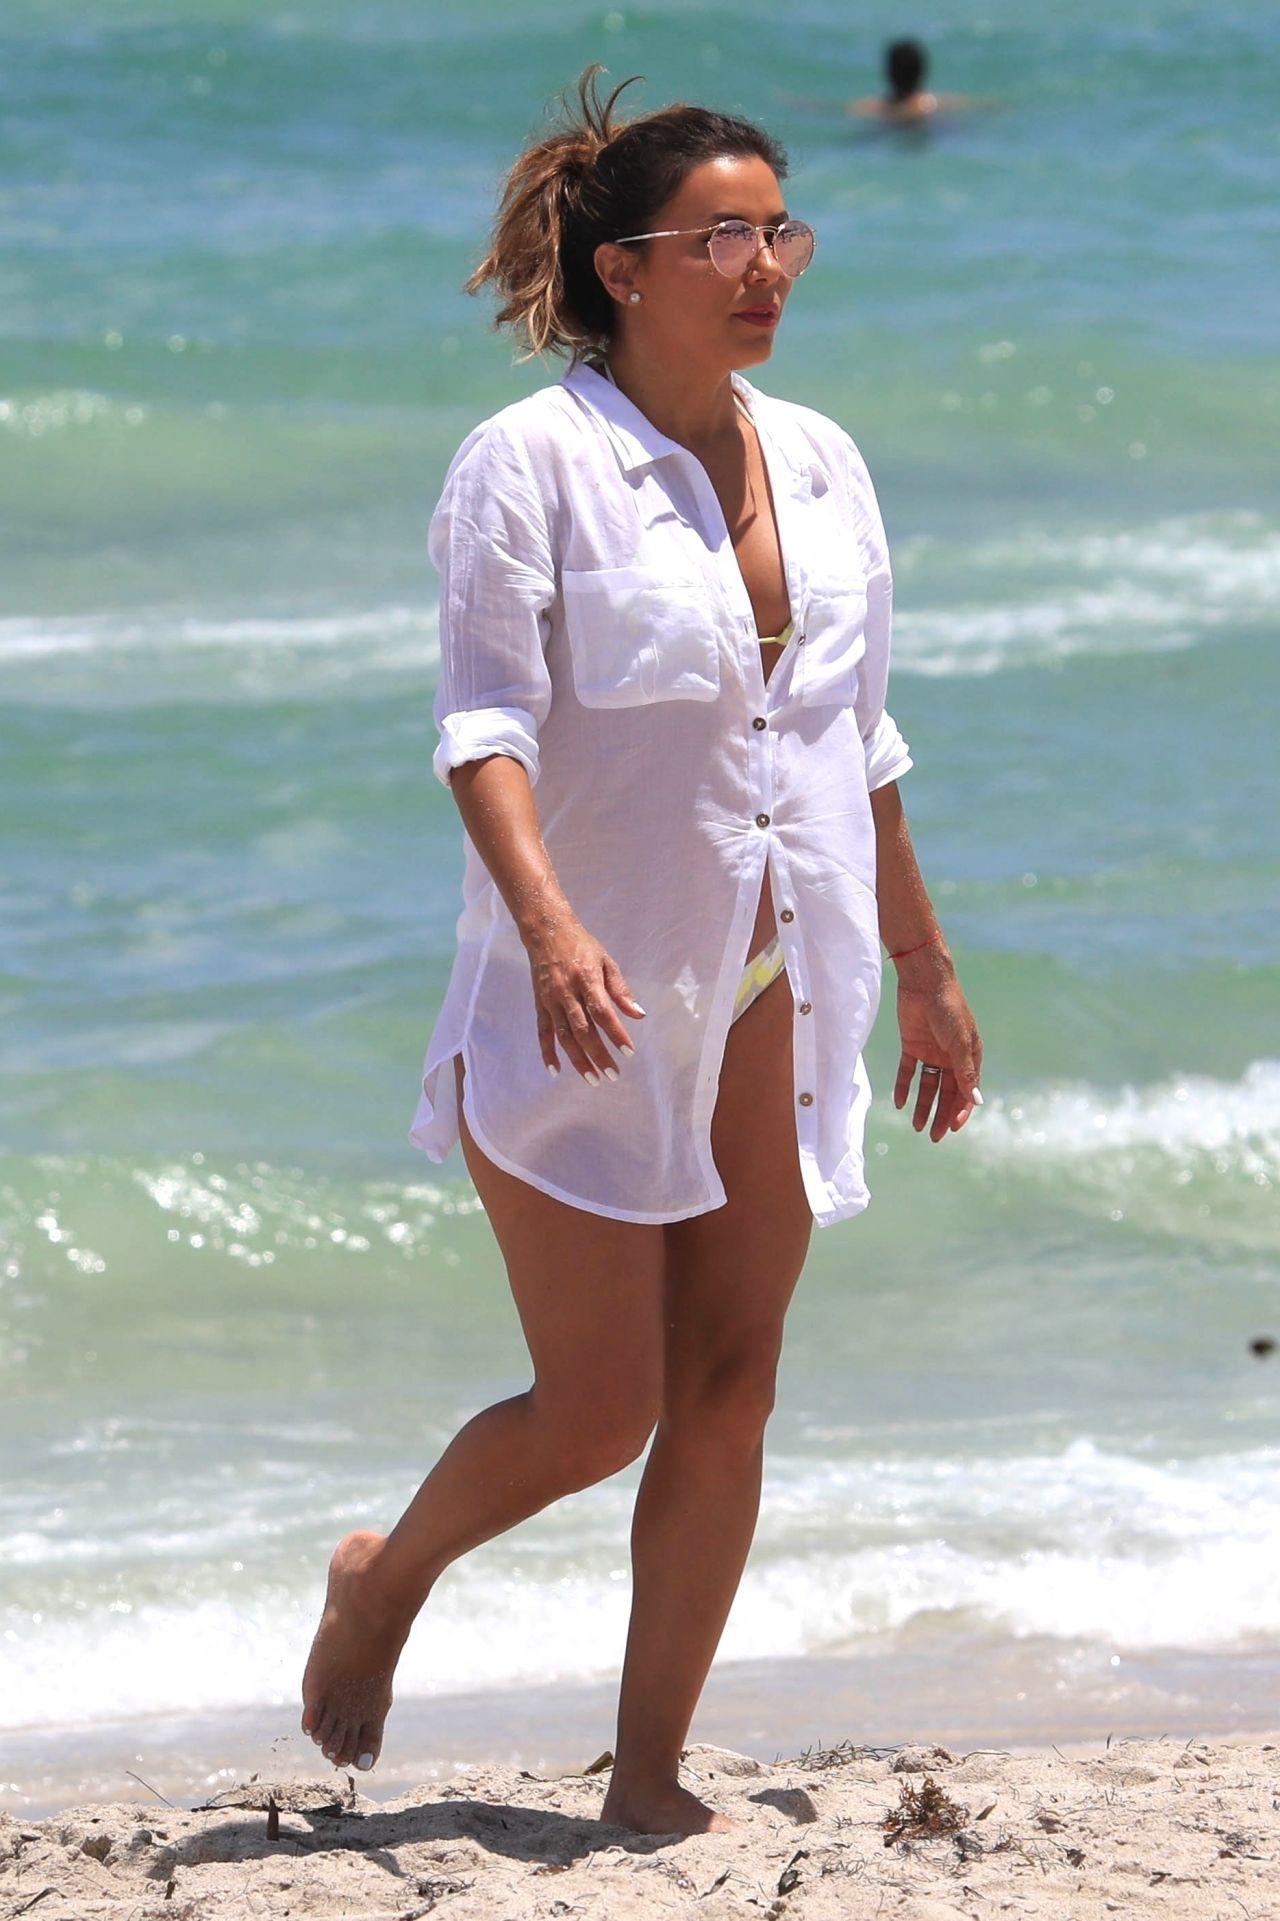 Eva longoria bikini candids beach in delos greece - 2019 year